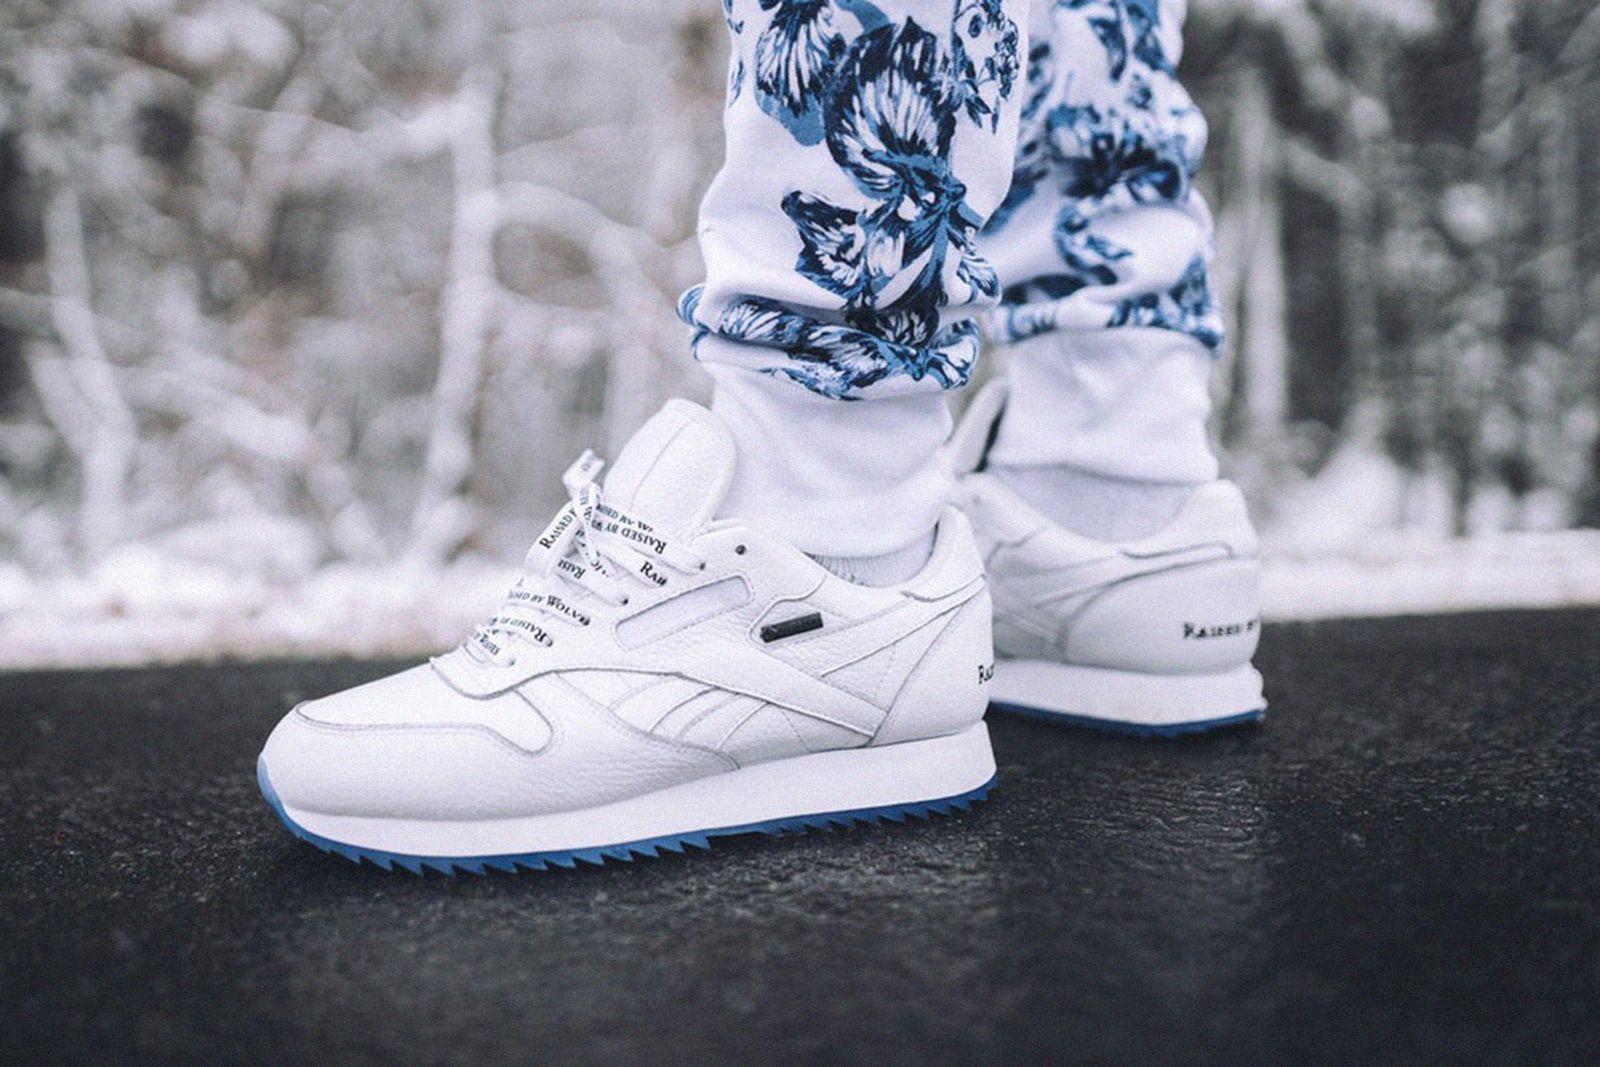 gore tex trend report Adidas OFF-WHITE c/o Virgil Abloh Supreme